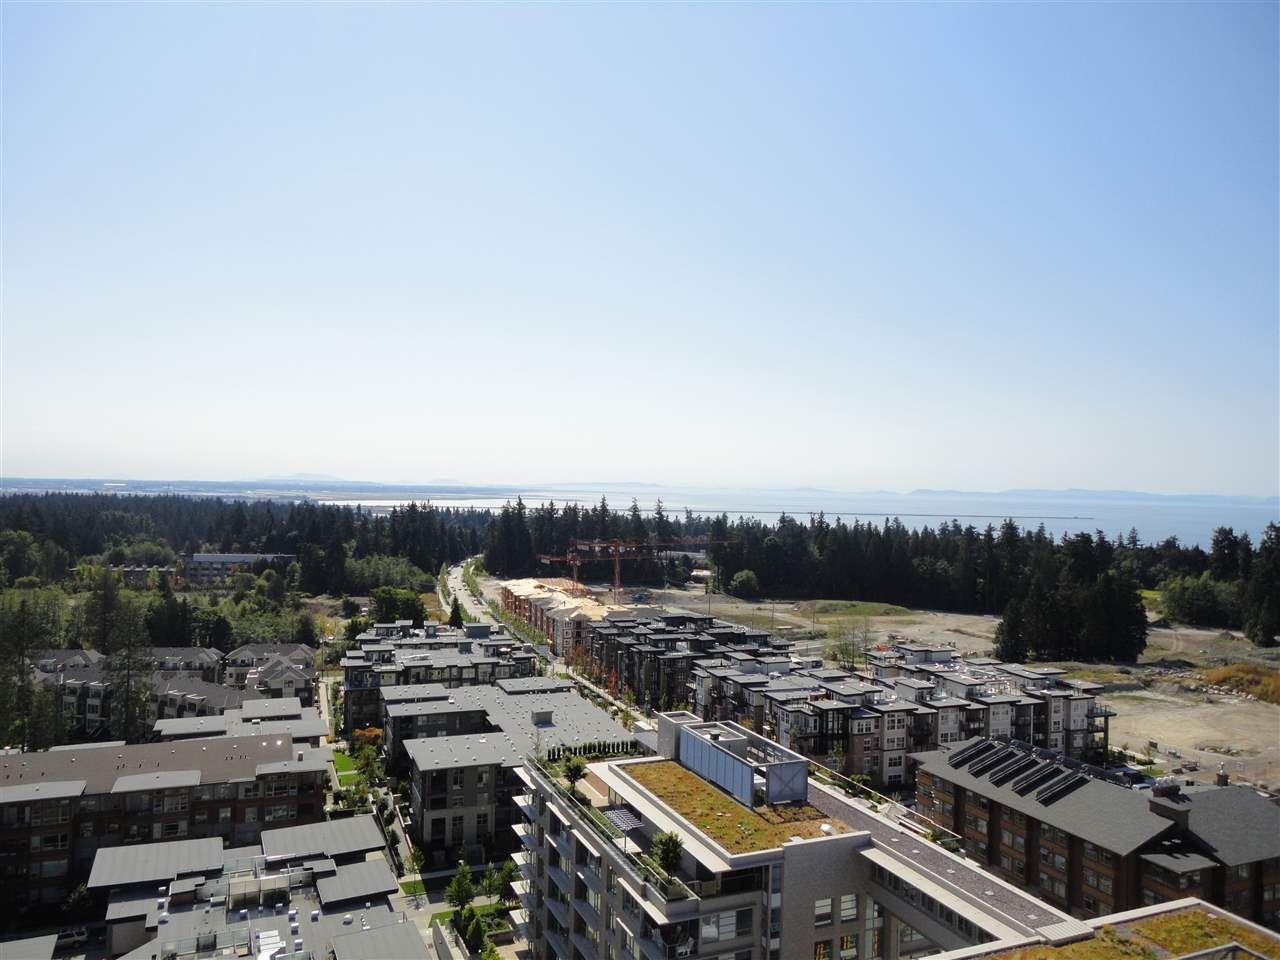 "Photo 12: Photos: 1600 5838 BERTON Avenue in Vancouver: University VW Condo for sale in ""WESBROOK"" (Vancouver West)  : MLS®# R2239956"